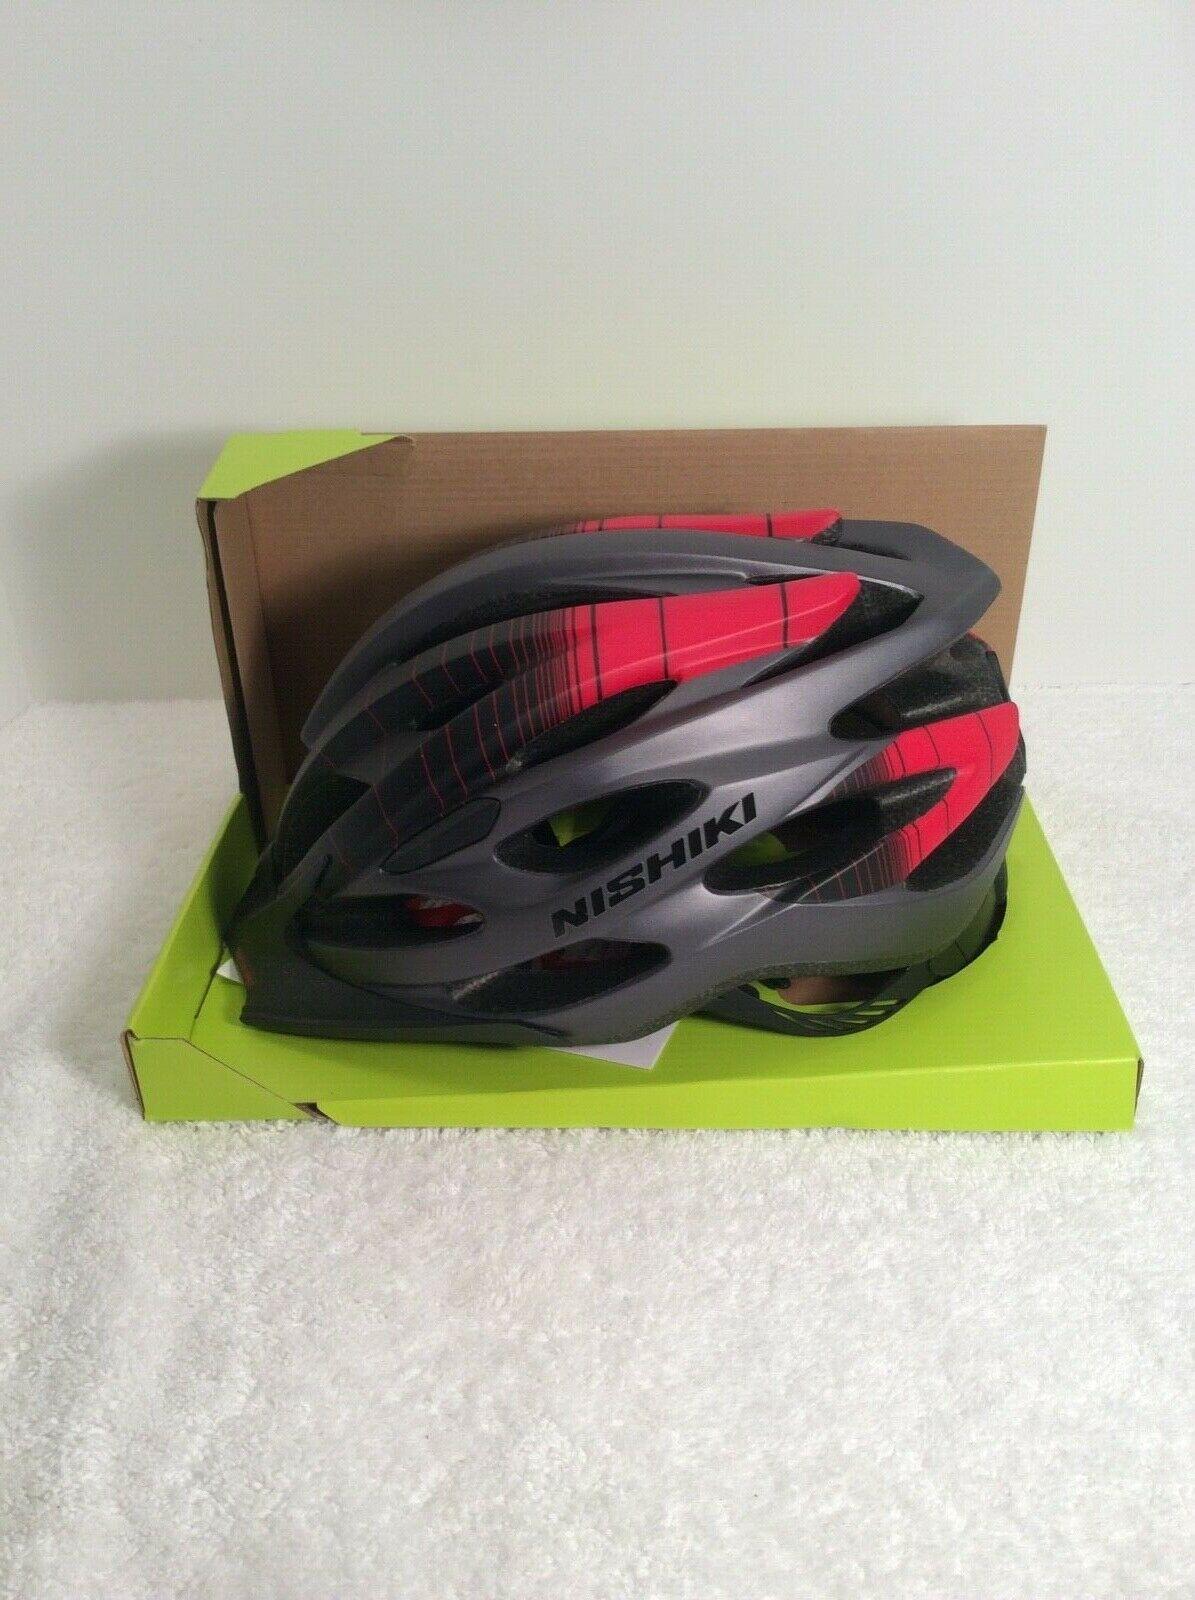 Nishiki Socorro Universal Fit Bike Helmet  Bicycle Helmets  Ideas of Bicycle Helmets